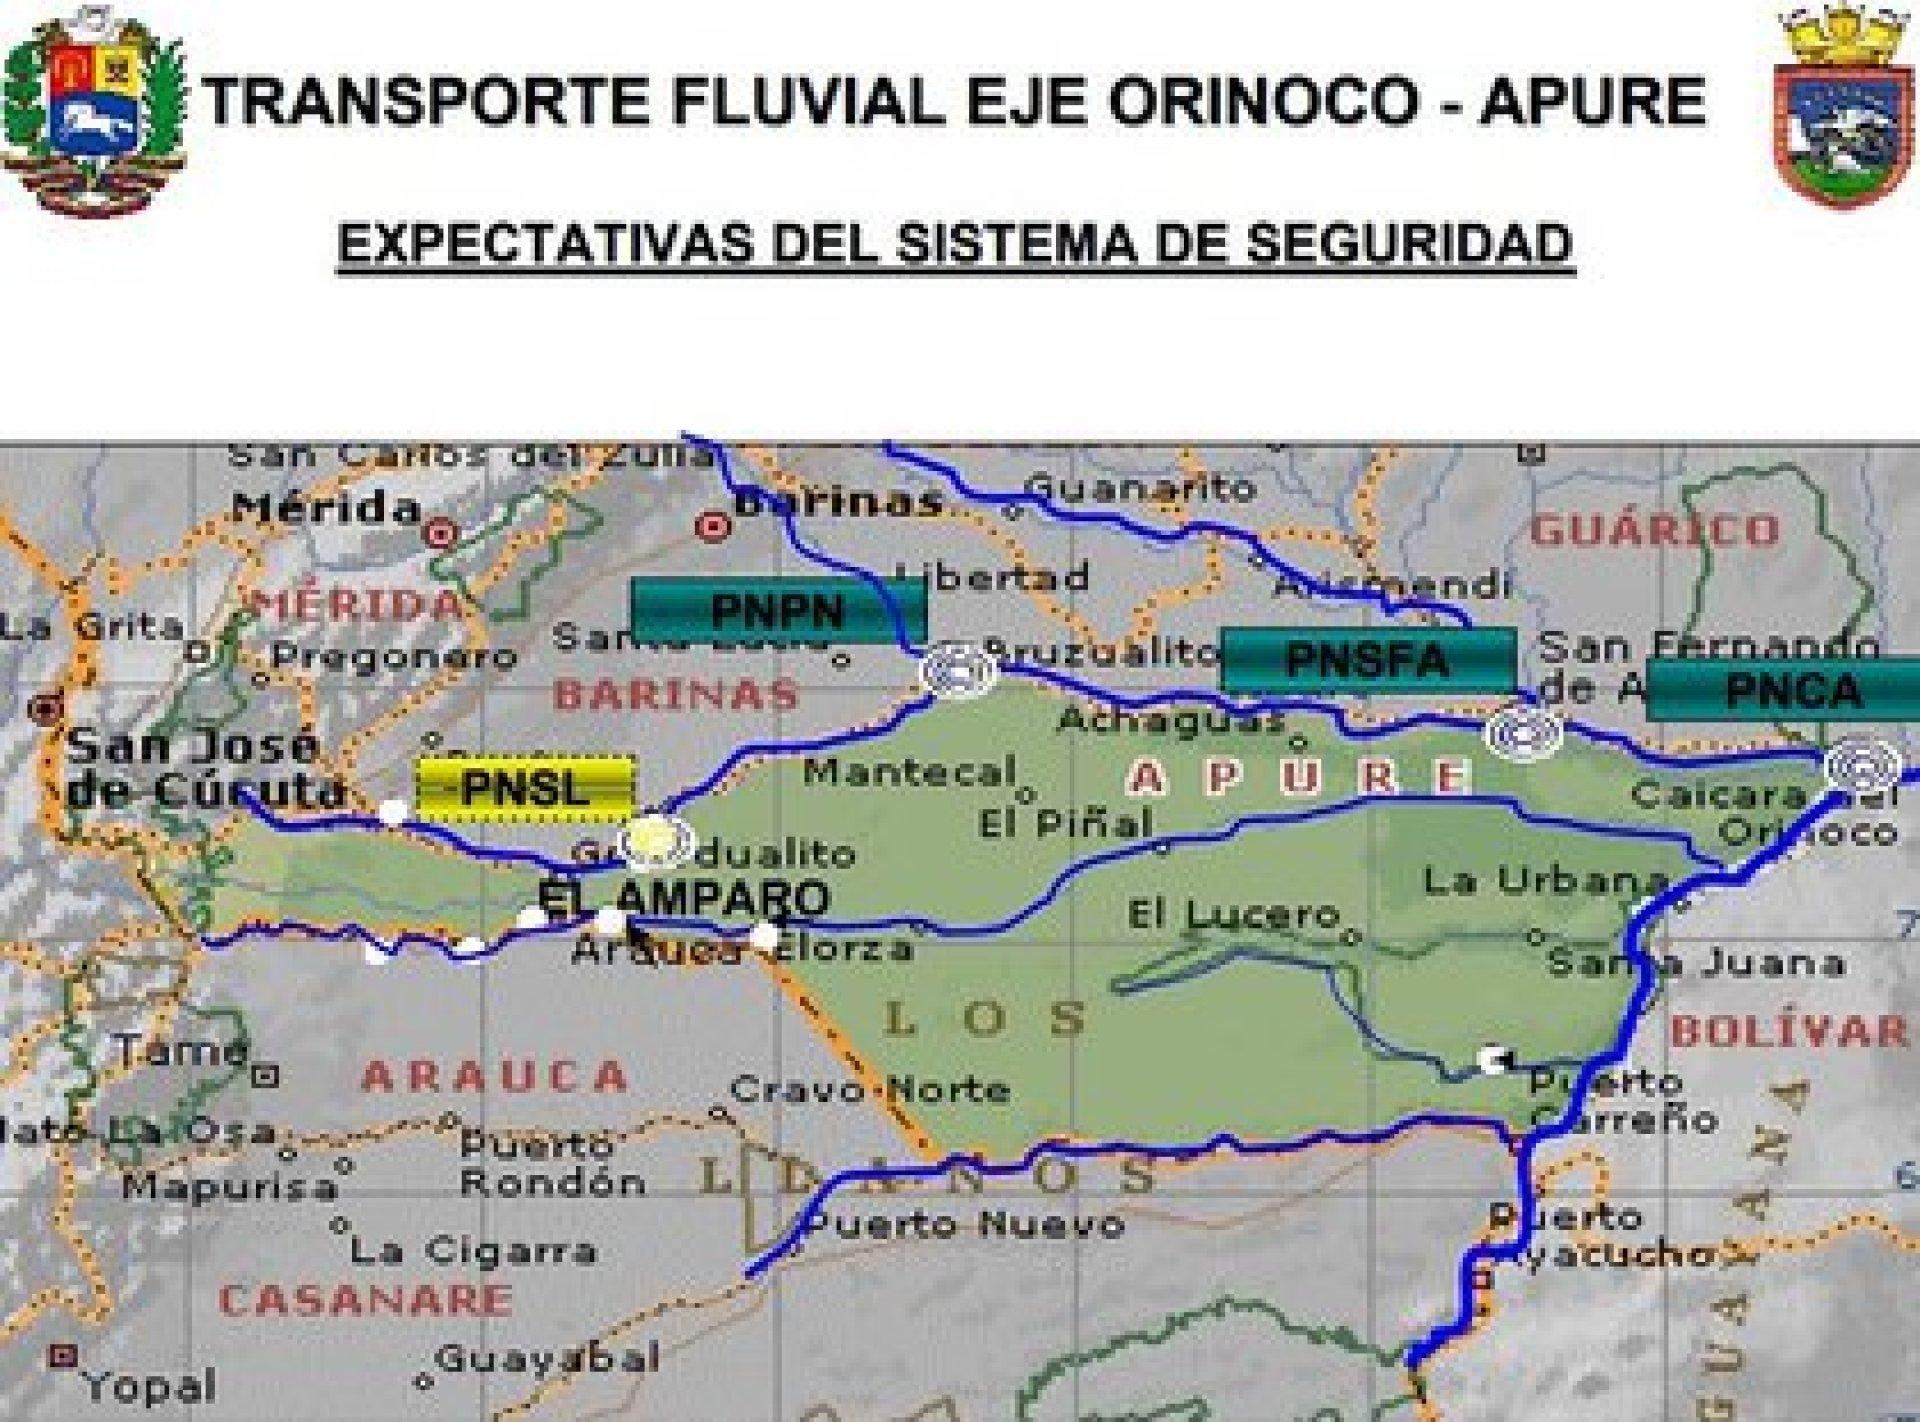 Sistema de Seguridad Transporte Fluvial Orinoco Apure. Lámina de Carlos Castellanos